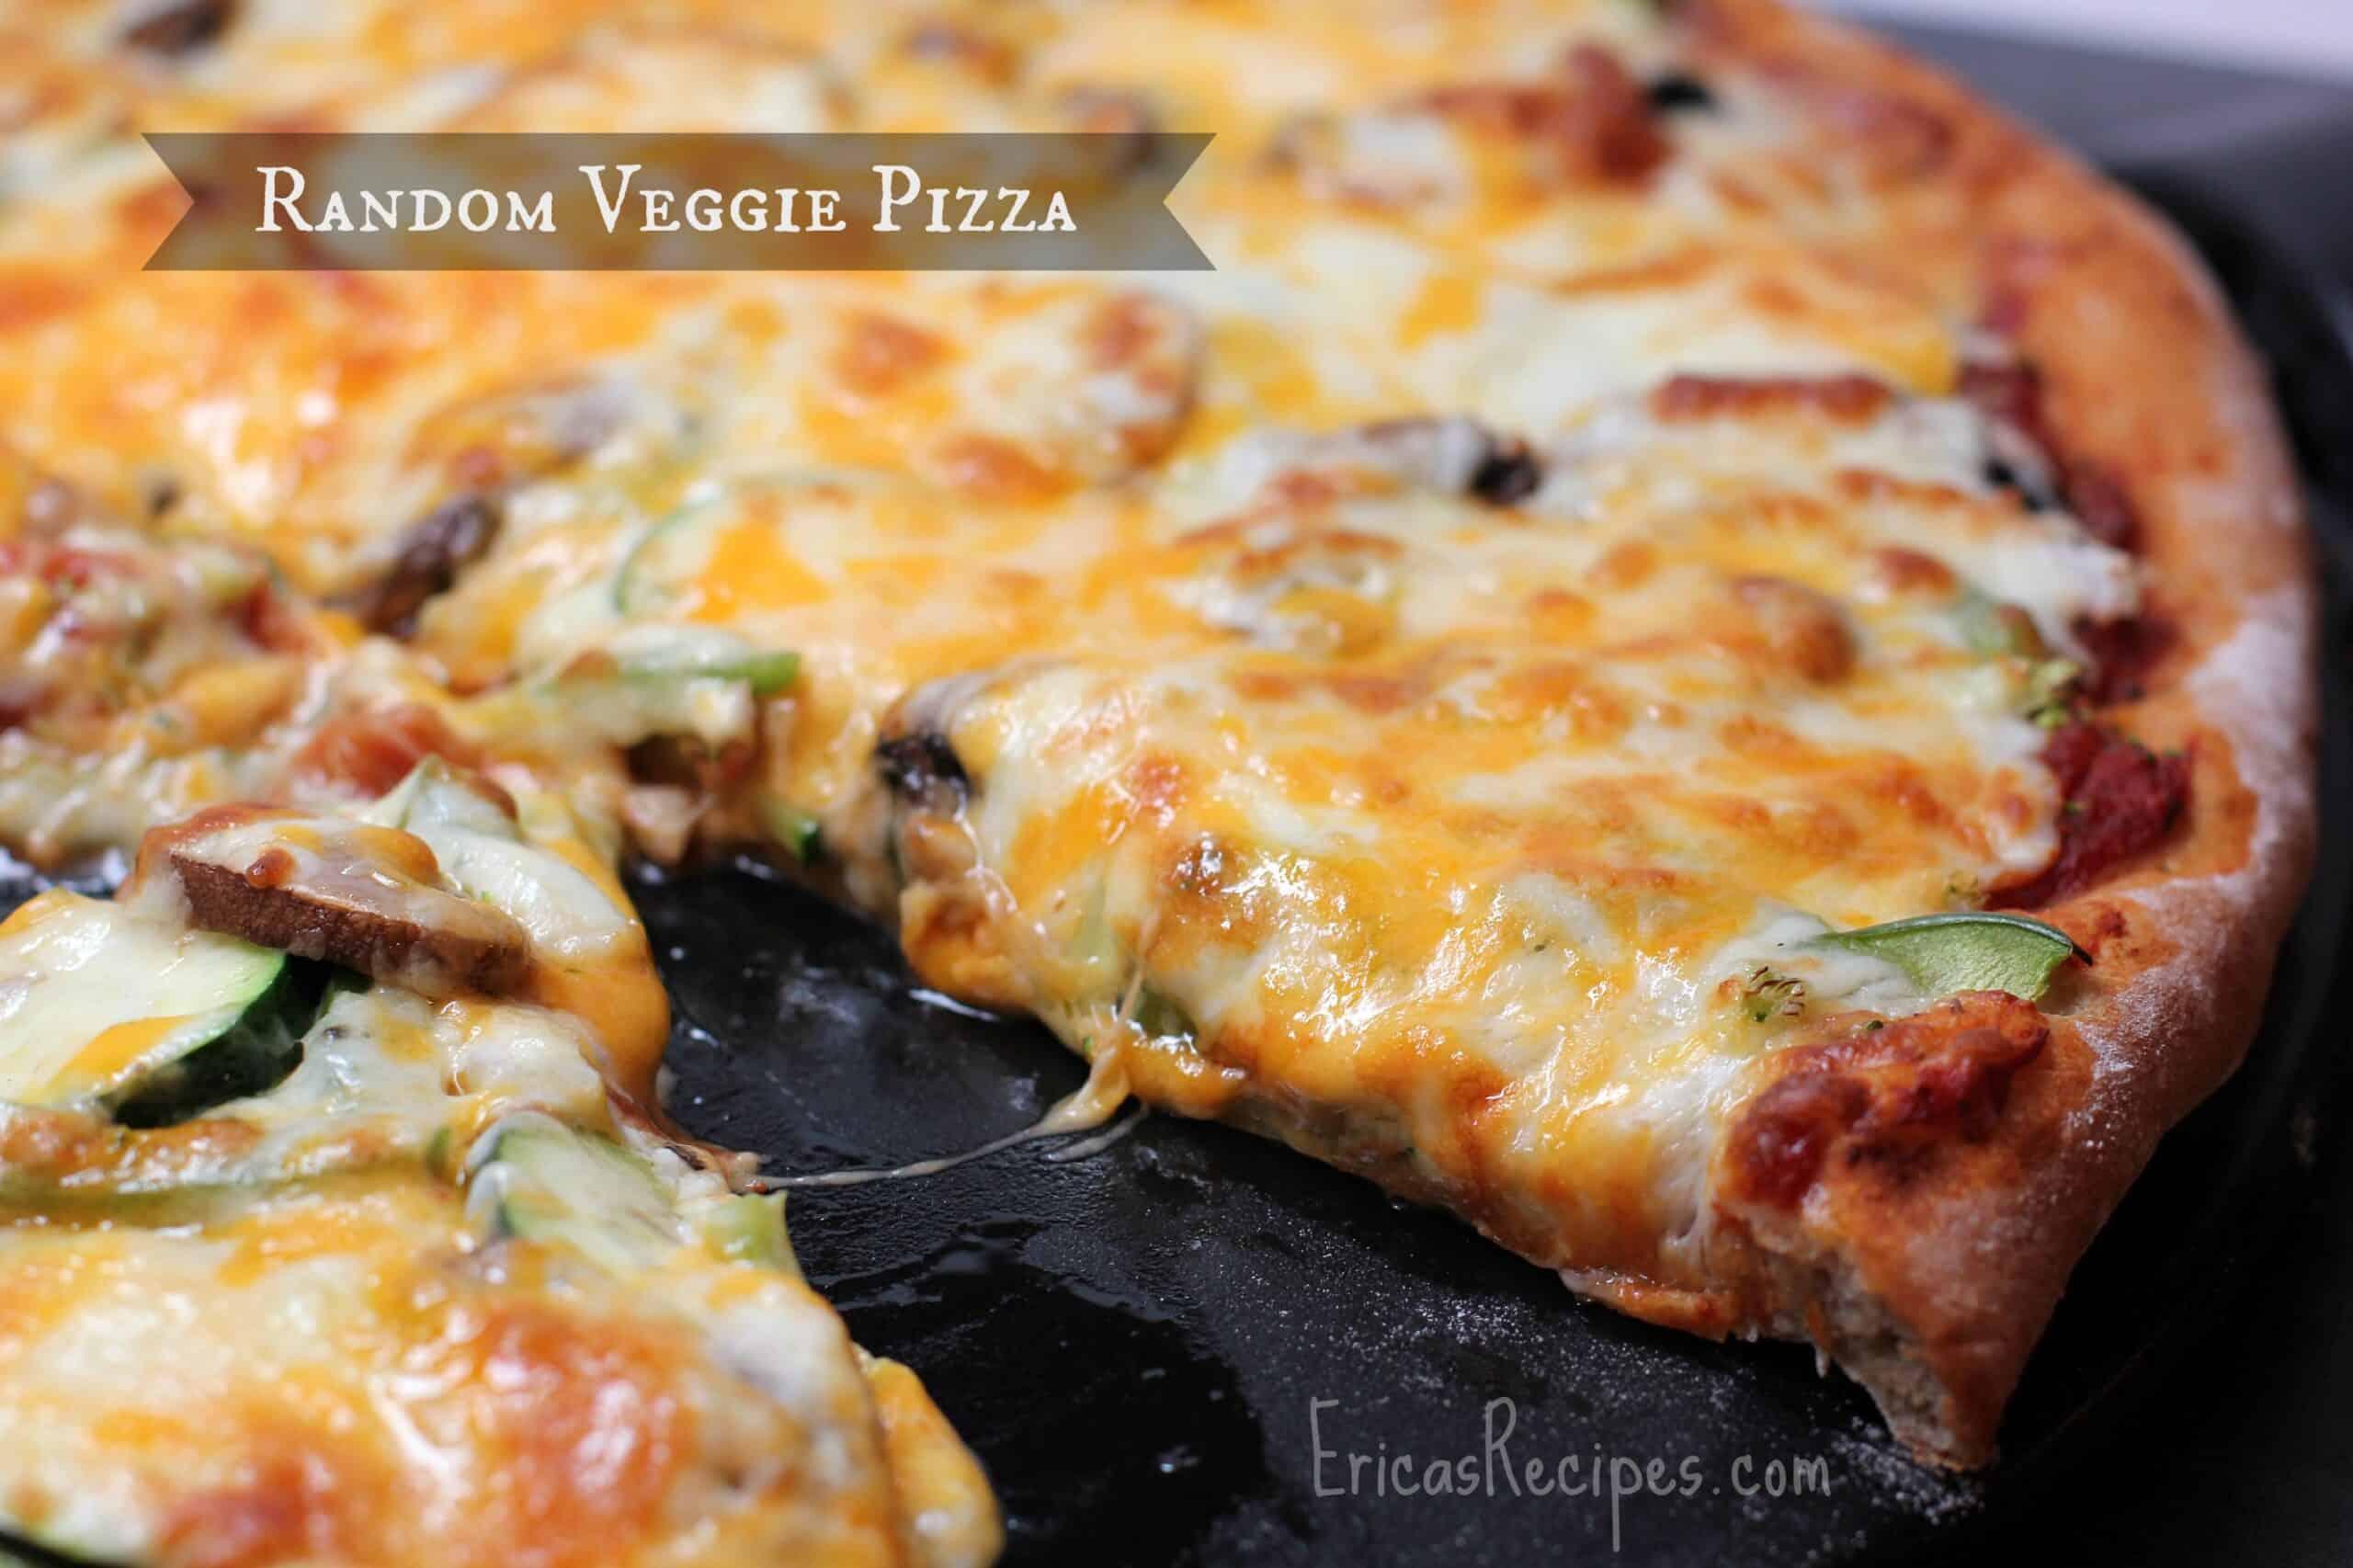 Random Veggie Pizza